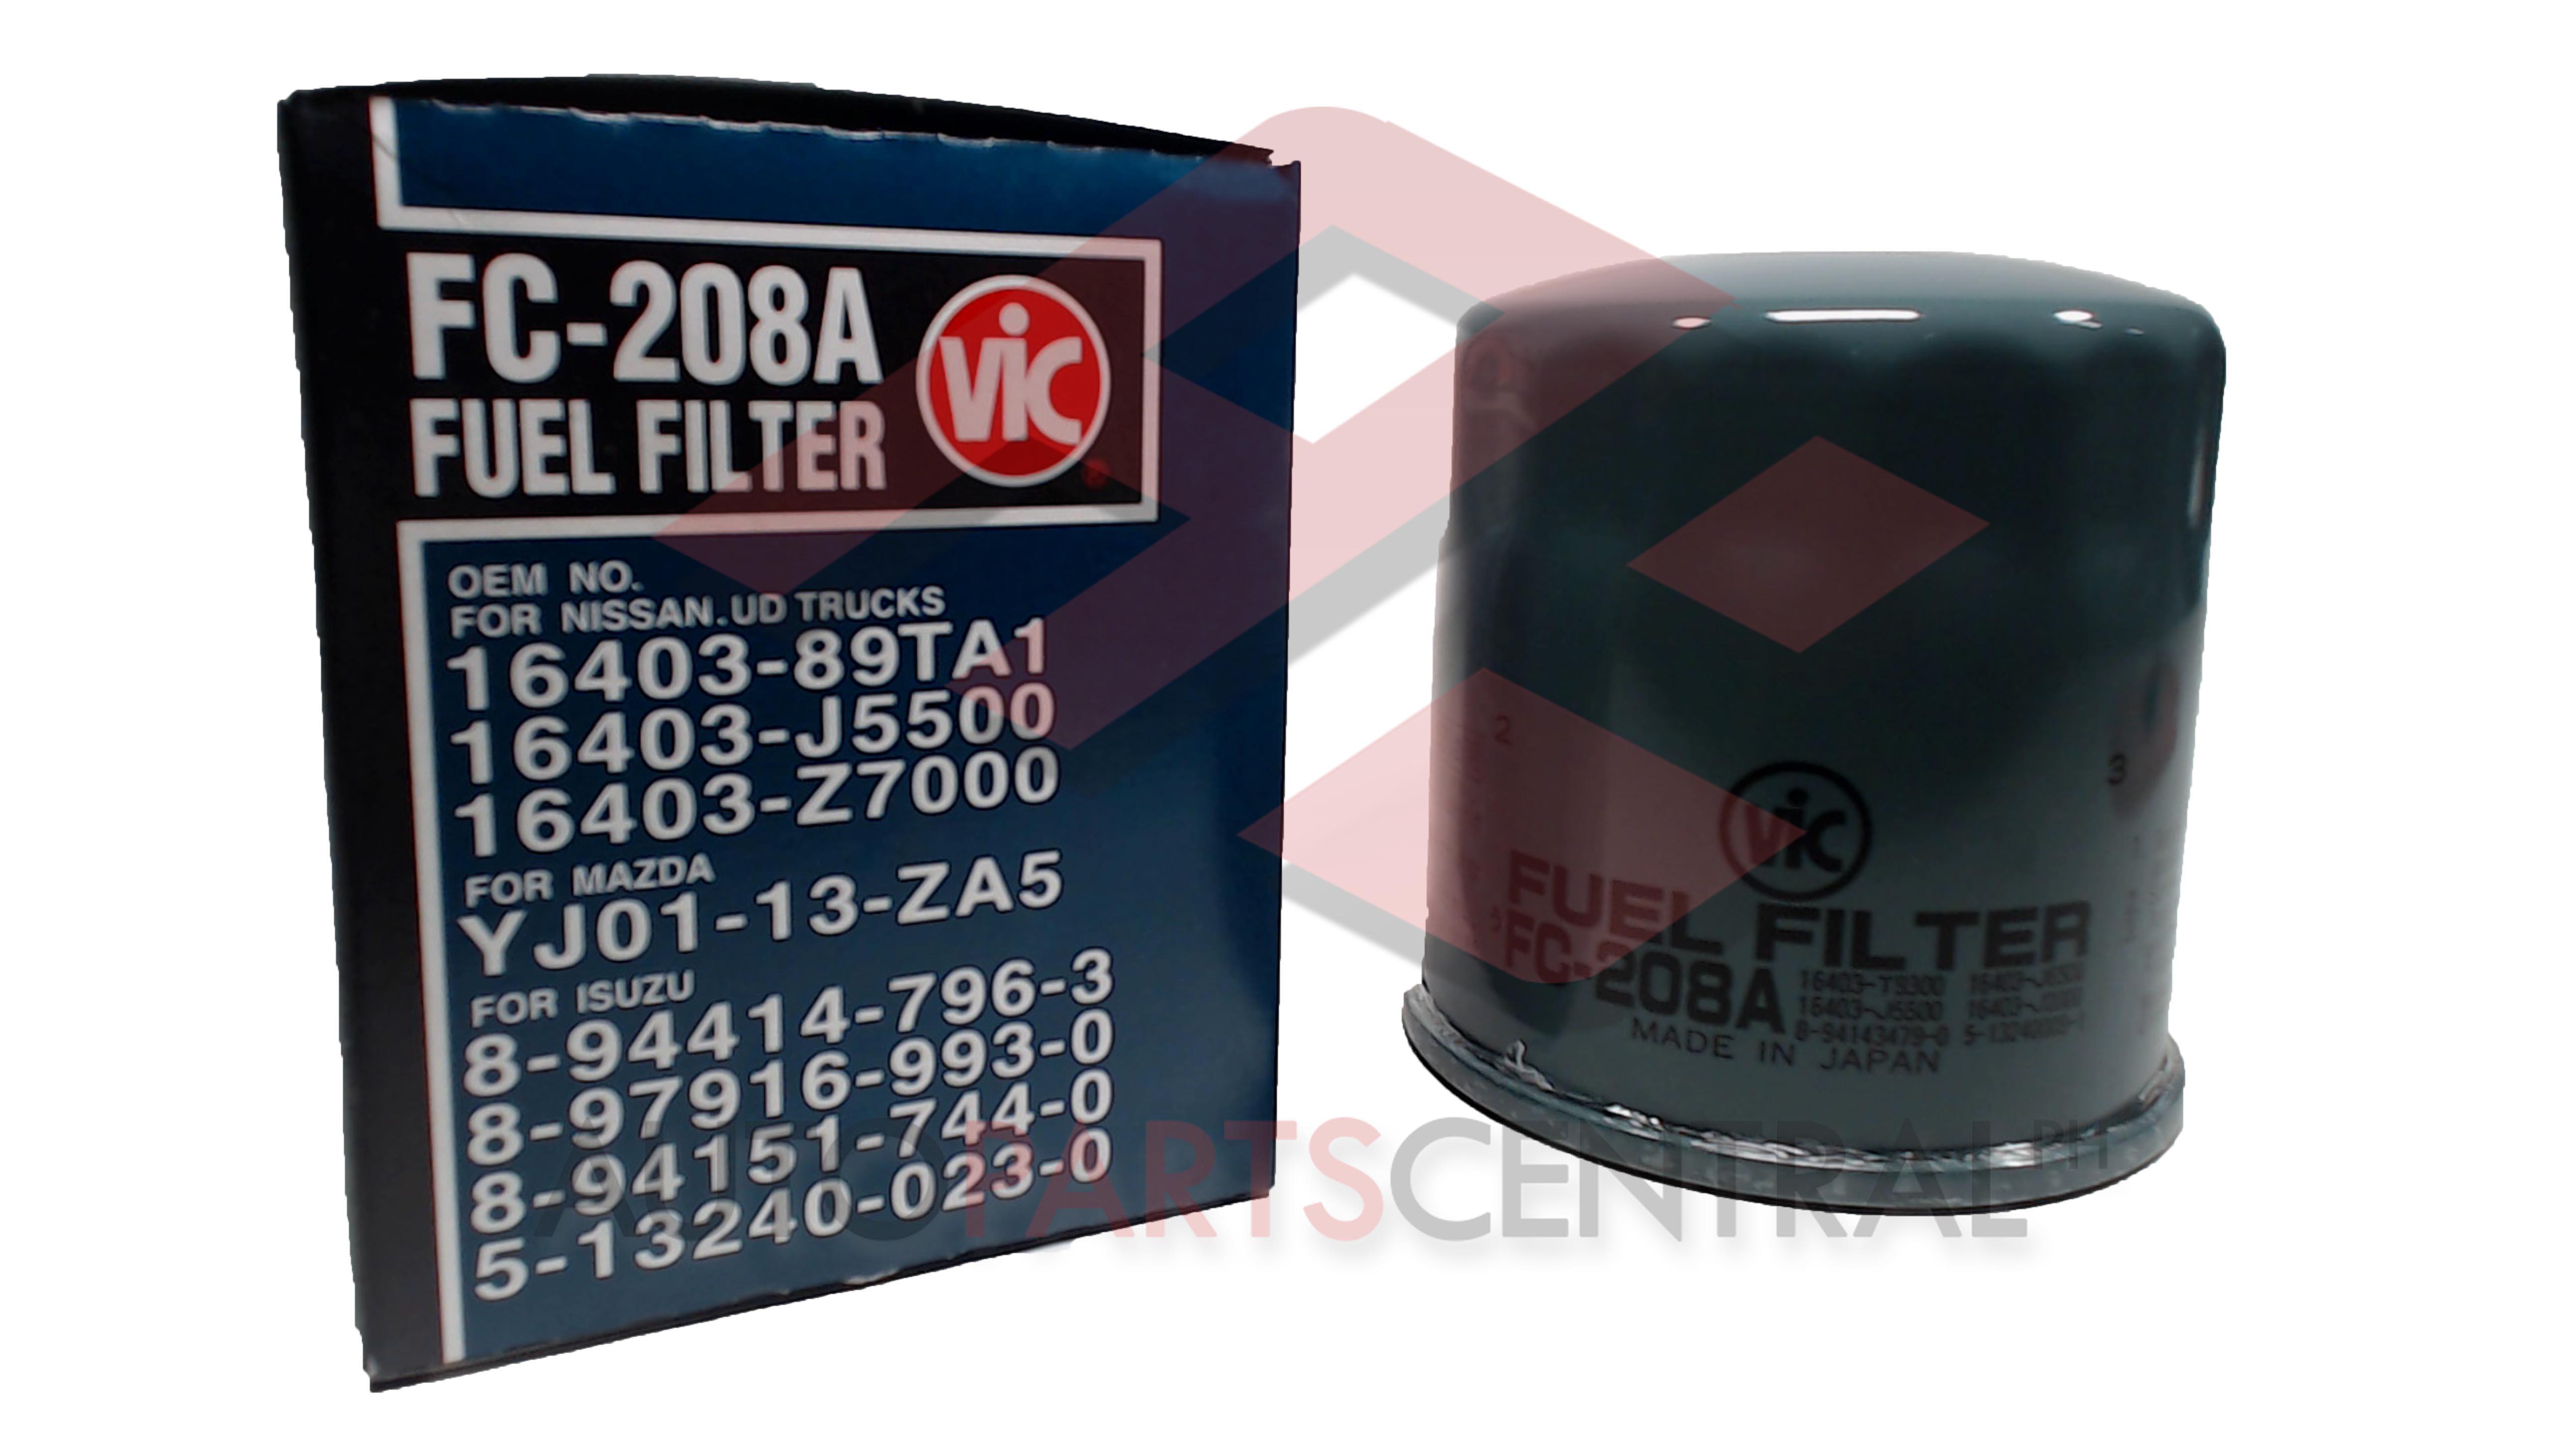 Fuel Filter Vic Fc208a Isuzu 4ba1 Autopartscentralph 2006 Mazda 3